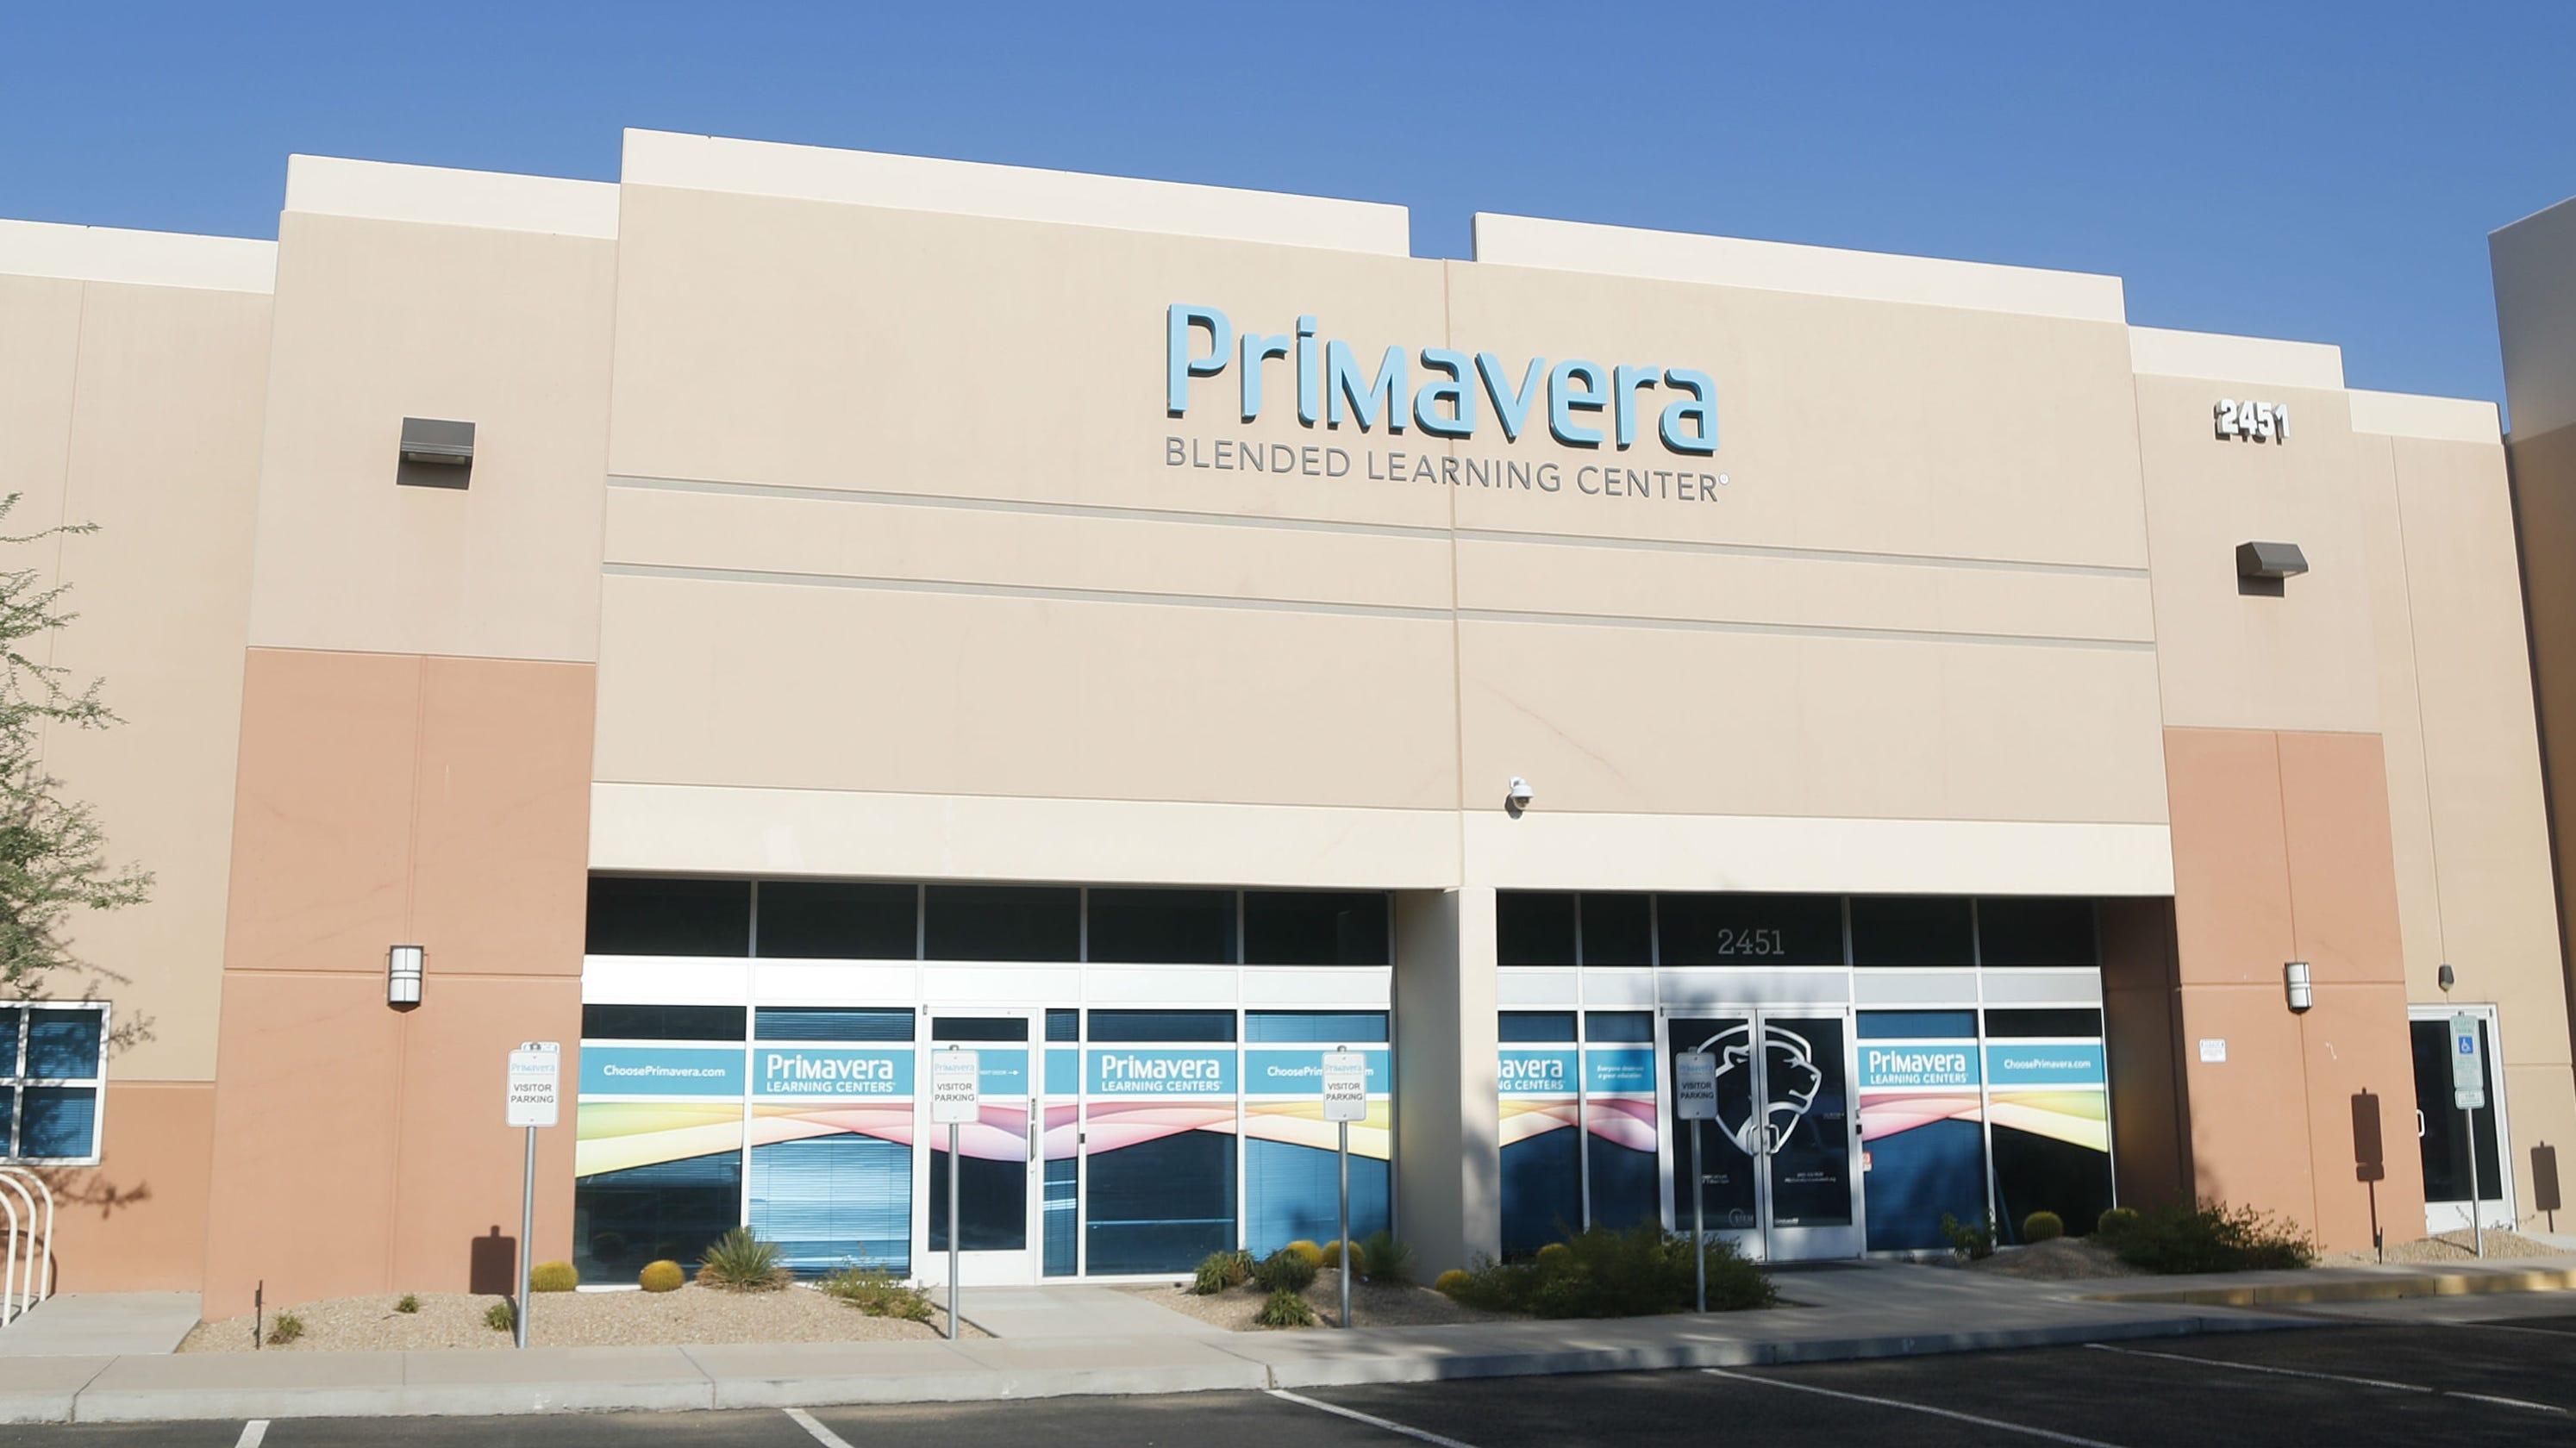 Arizona charter school got a PPP loan, gave $10 million to shareholder